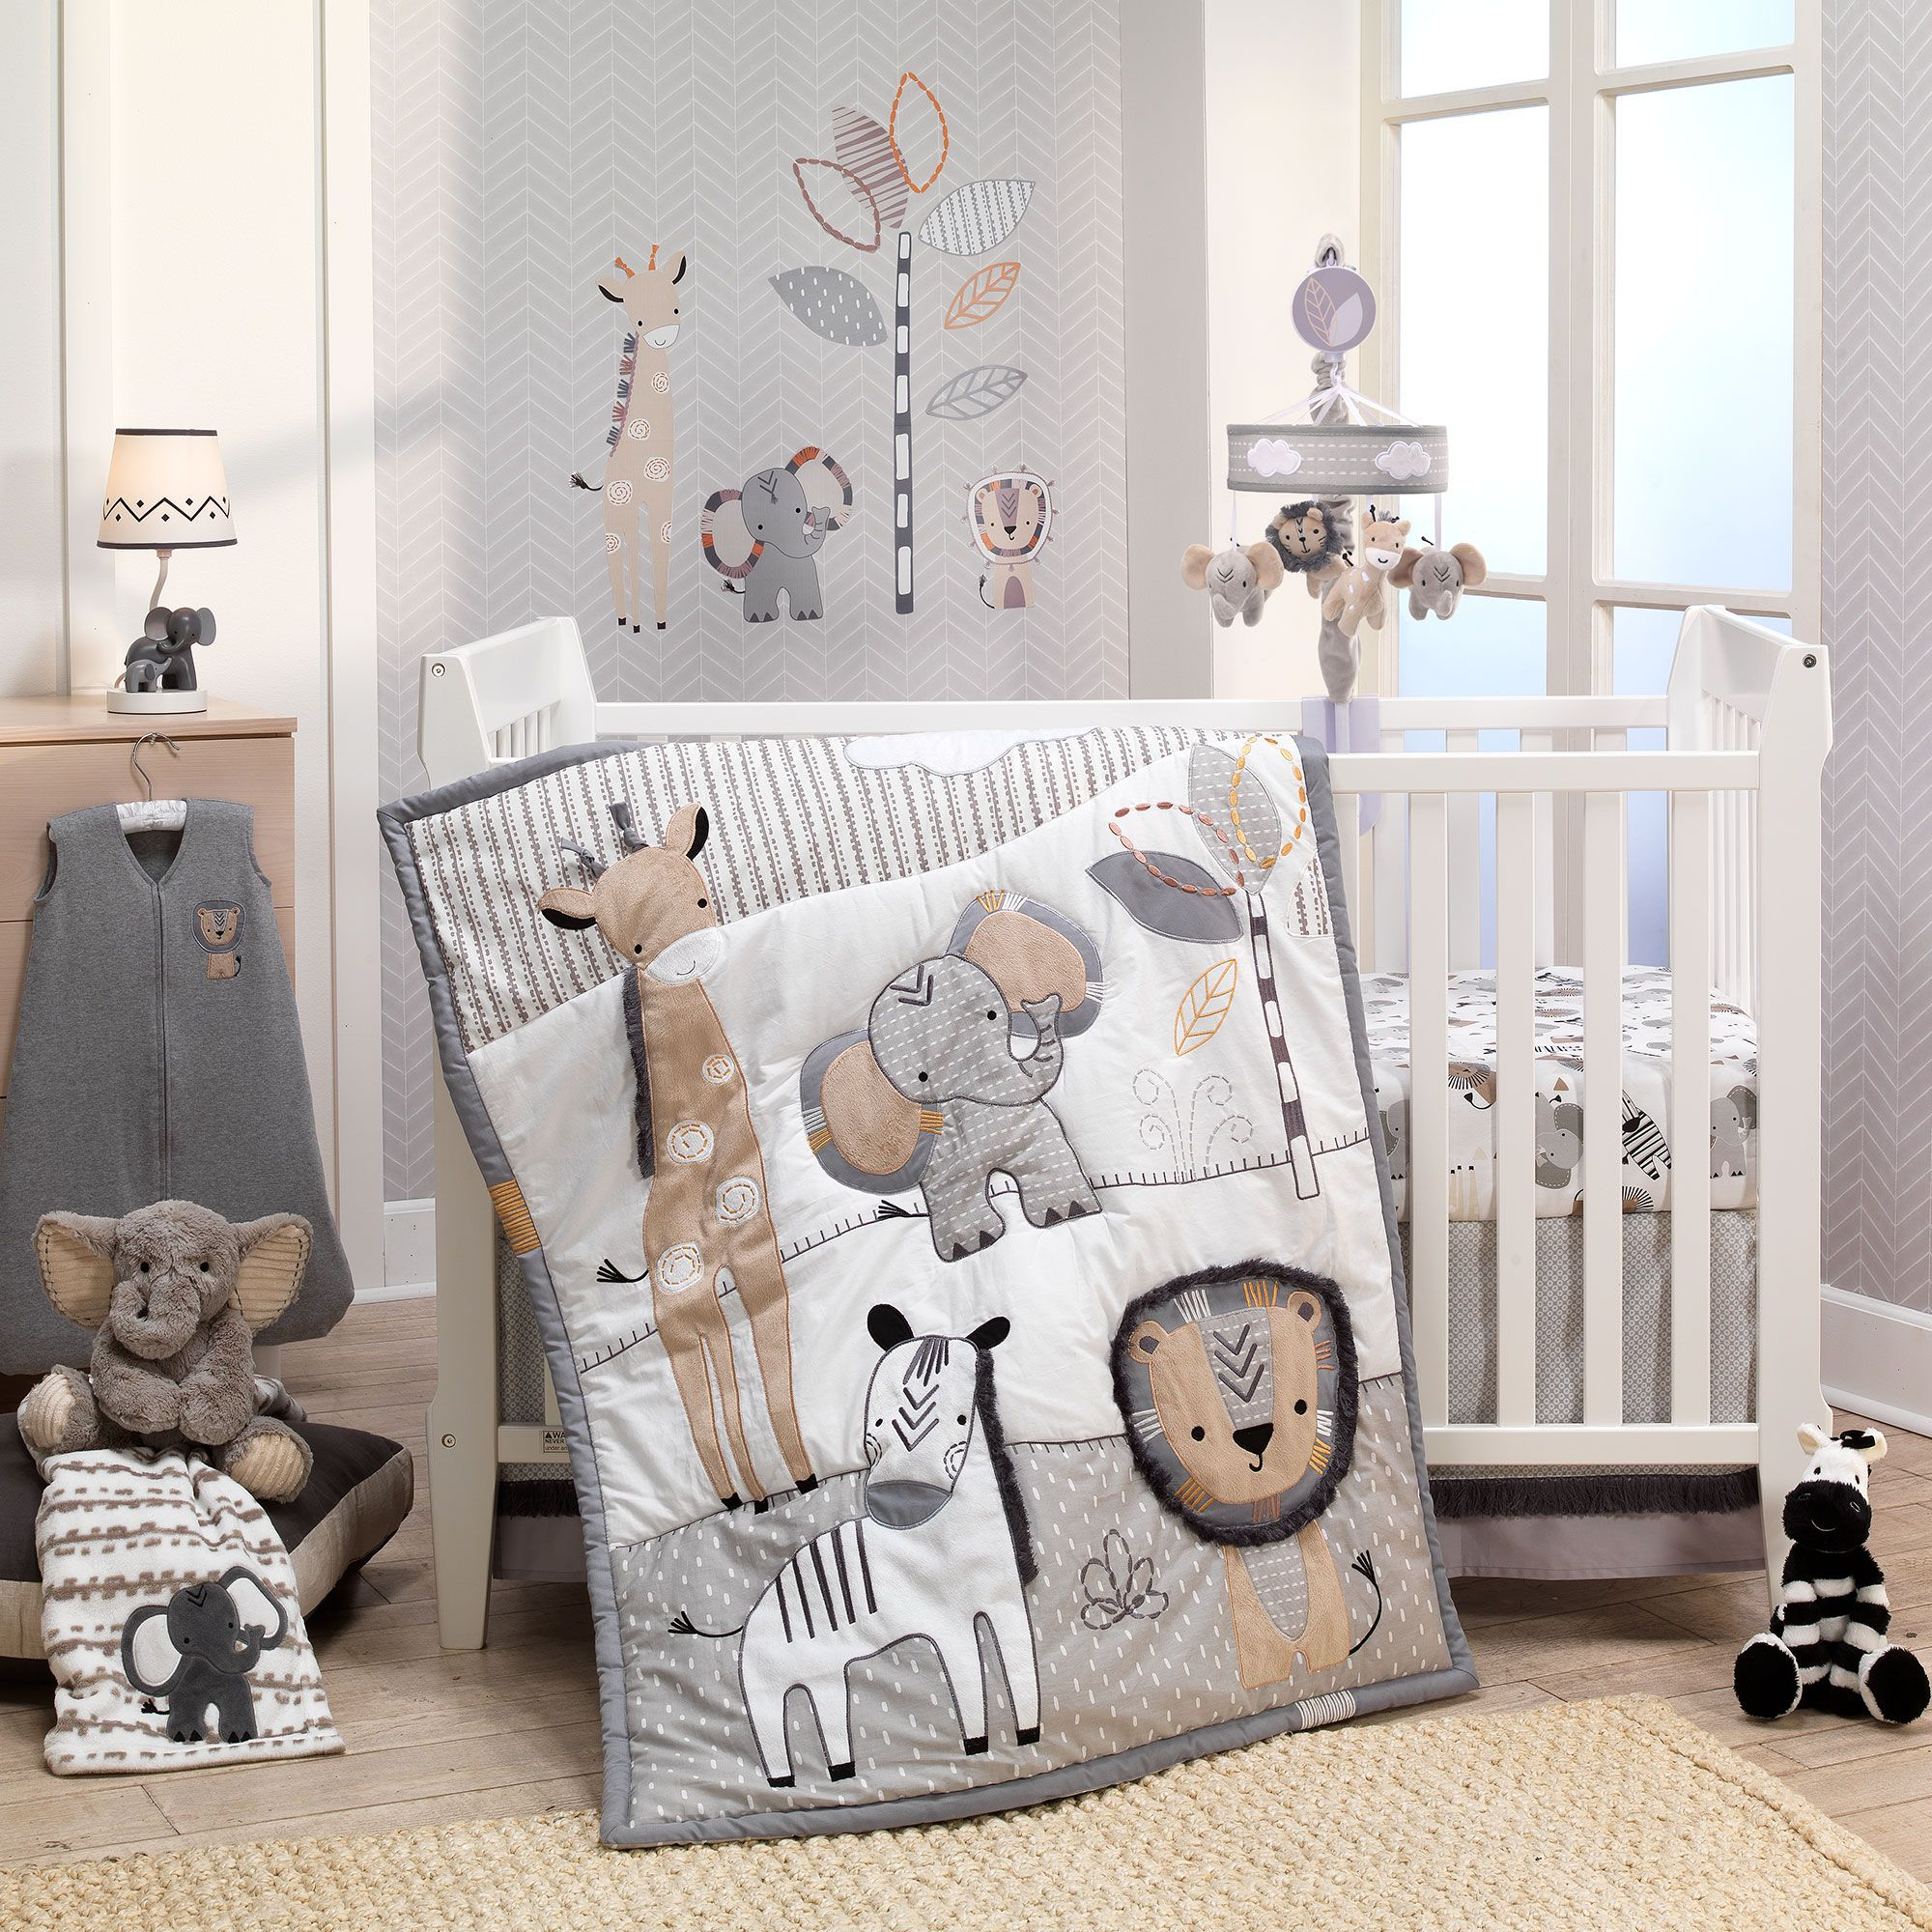 Jungle Safari 6 Piece Baby Crib Bedding Set Baby Bedding Sets Baby Crib Bedding Sets Baby Bed